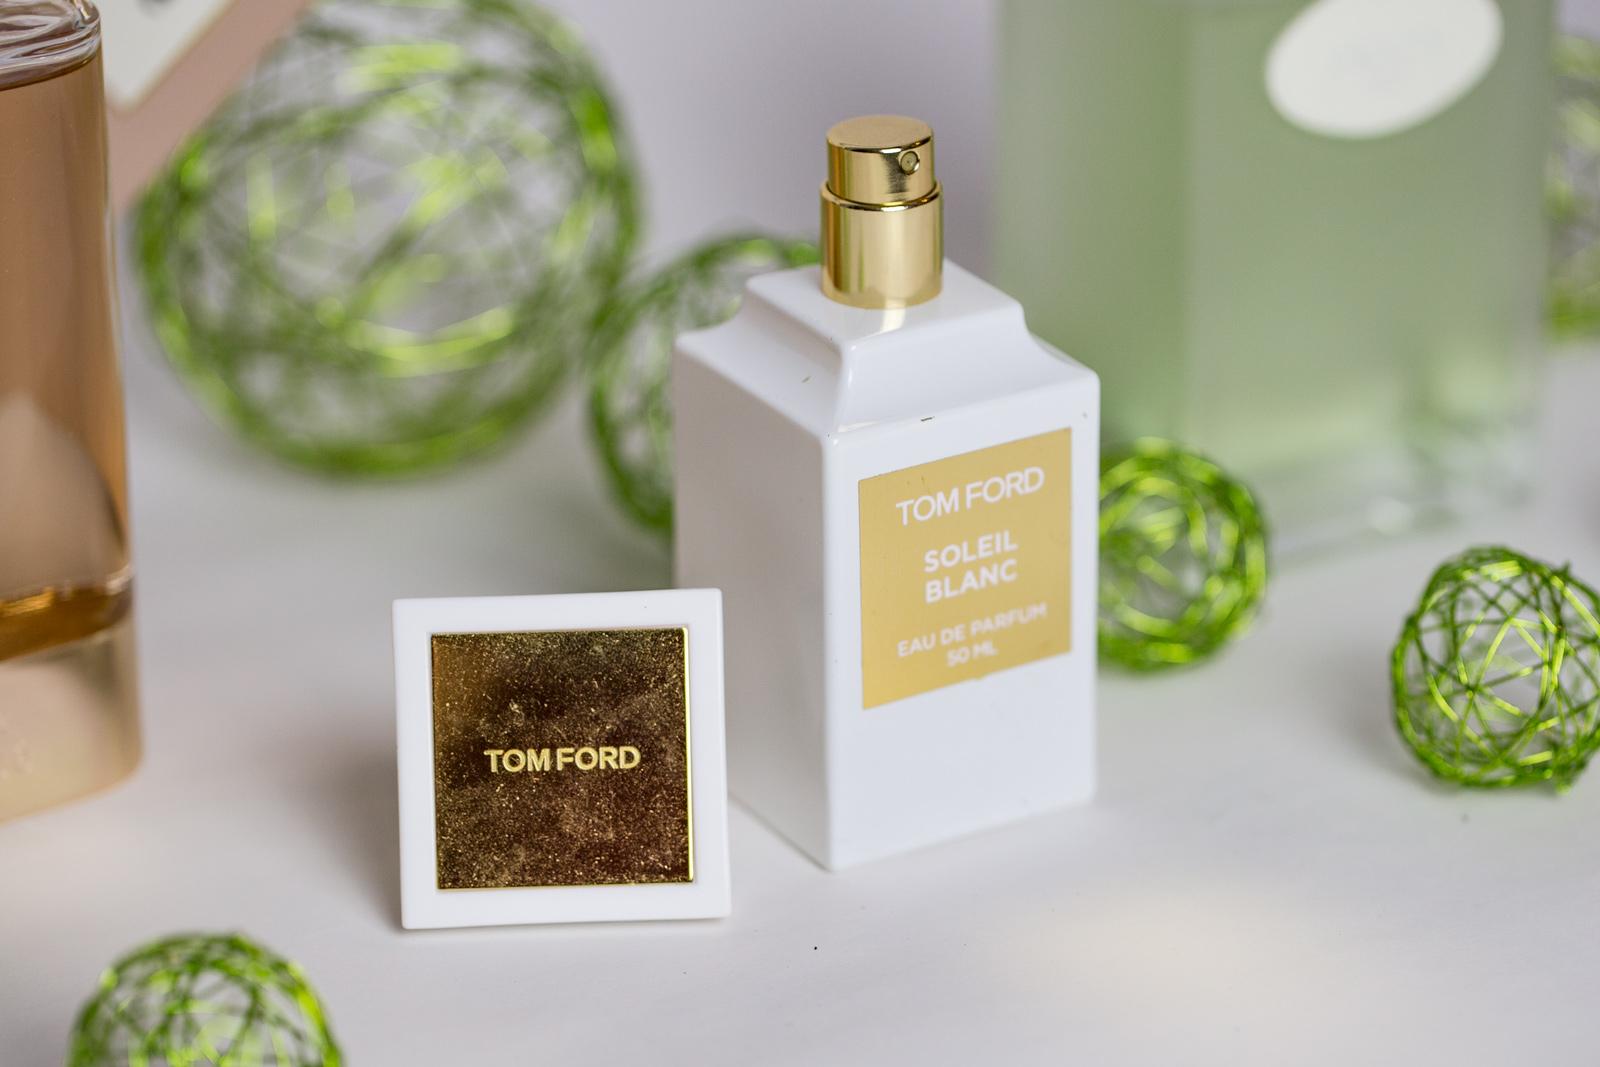 Foto_by_Nadja_Nemetz_Wien_Sommer_Summer_Parfüms_Perfumes_Chloe_Prada_Tom_Ford_Soleil_Blanc_Infusion_Love_Beauty_Beatyblogger_Blogger_2